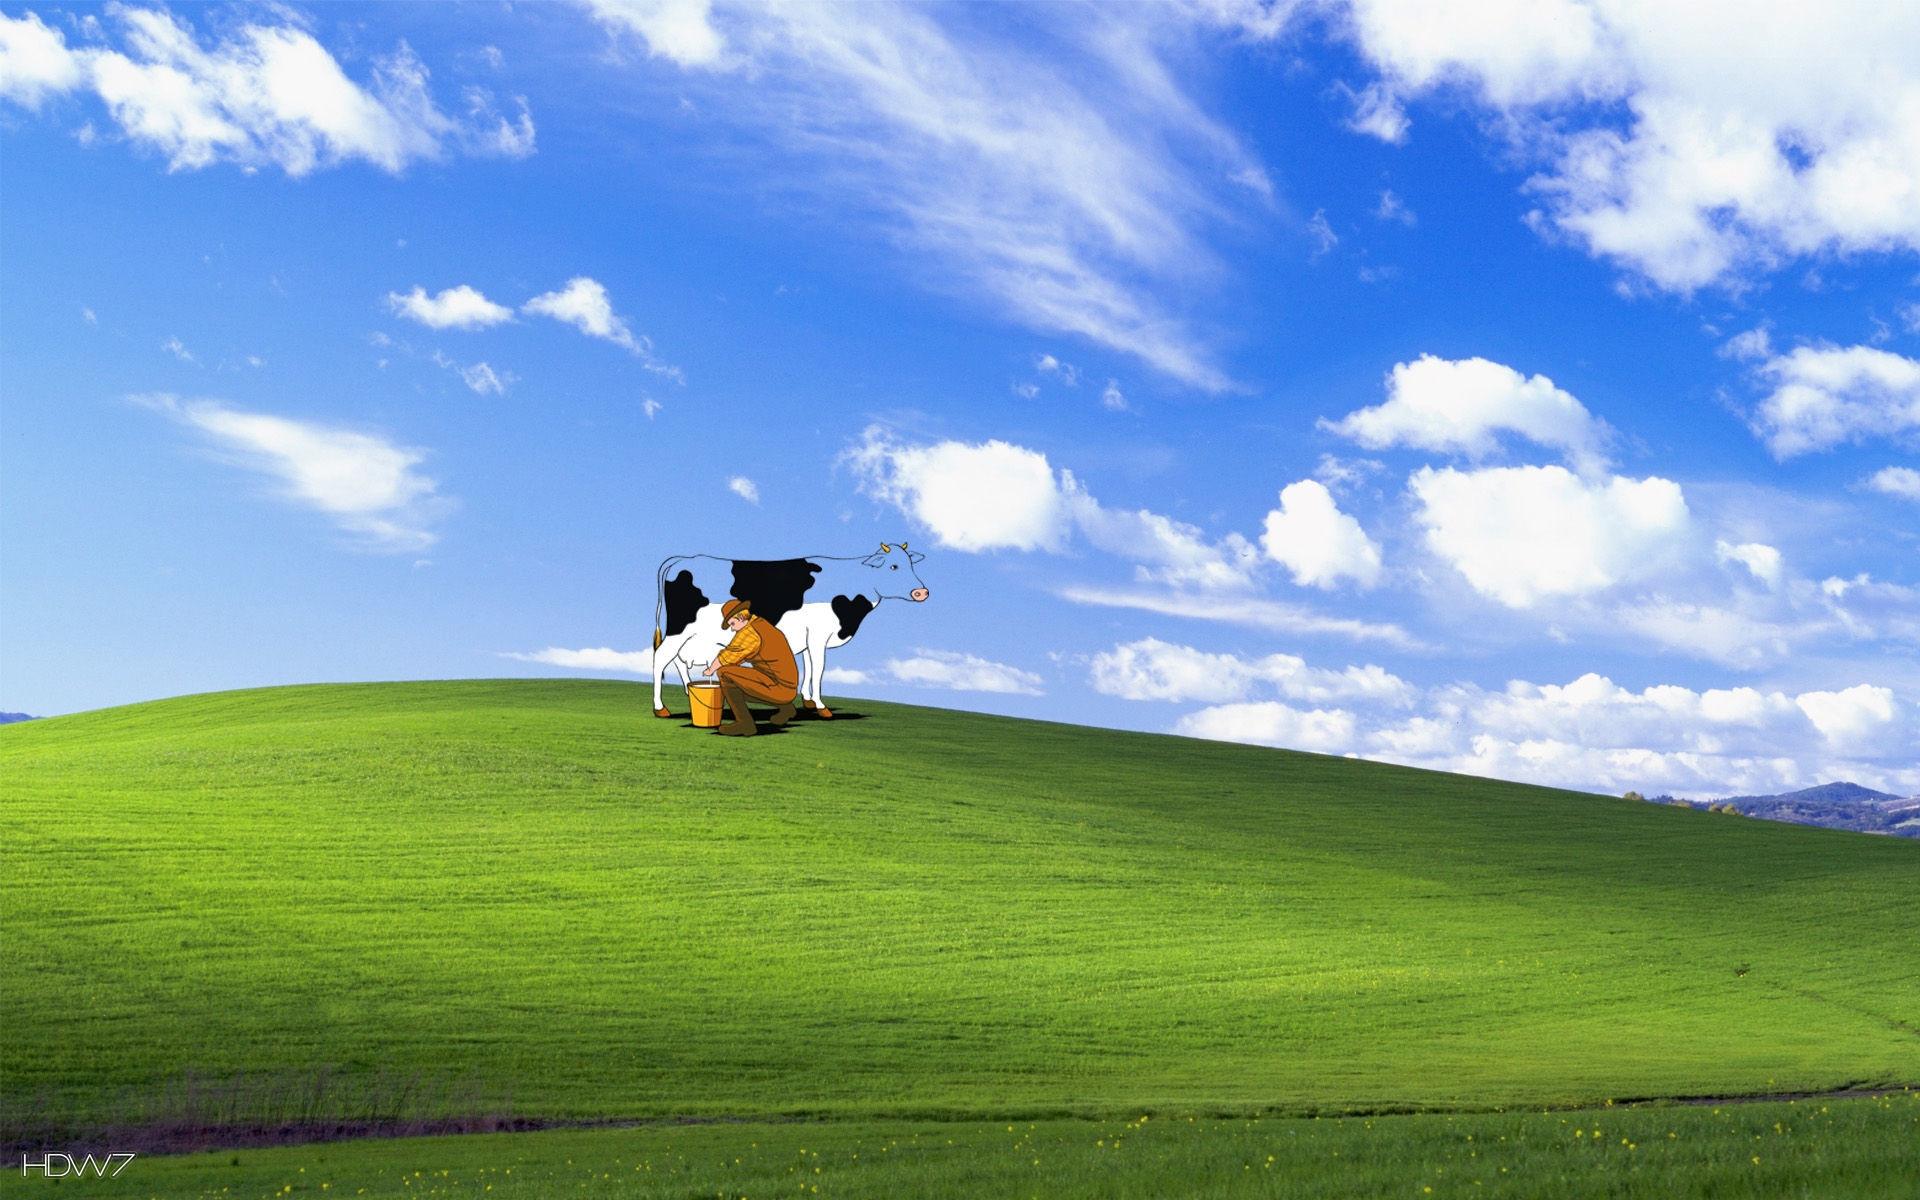 Funny Desktop Wallpaper Windows 7